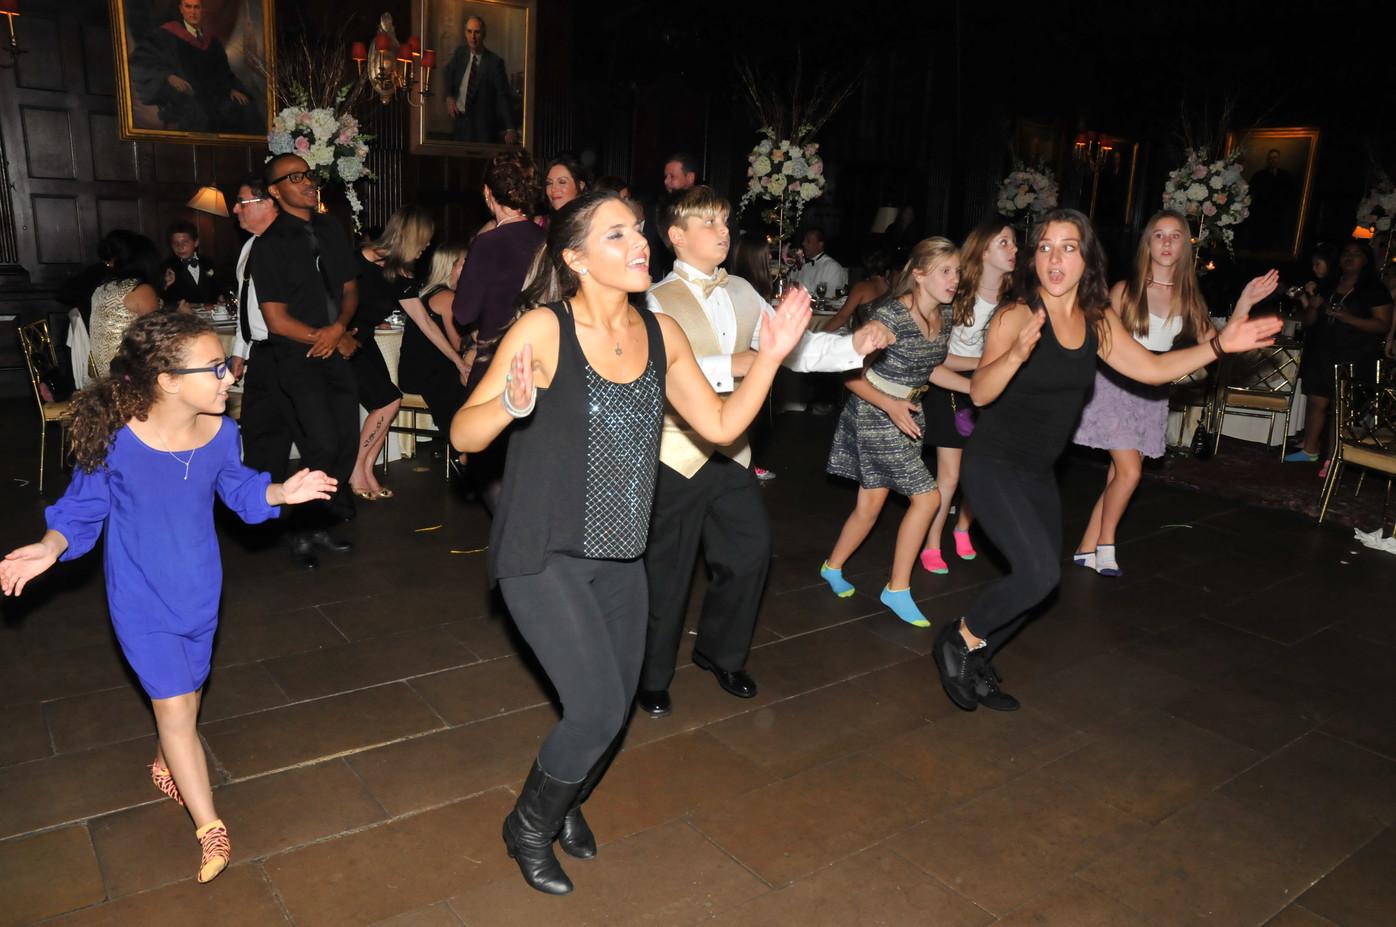 Motivational-Dancer-For-Party.JPG